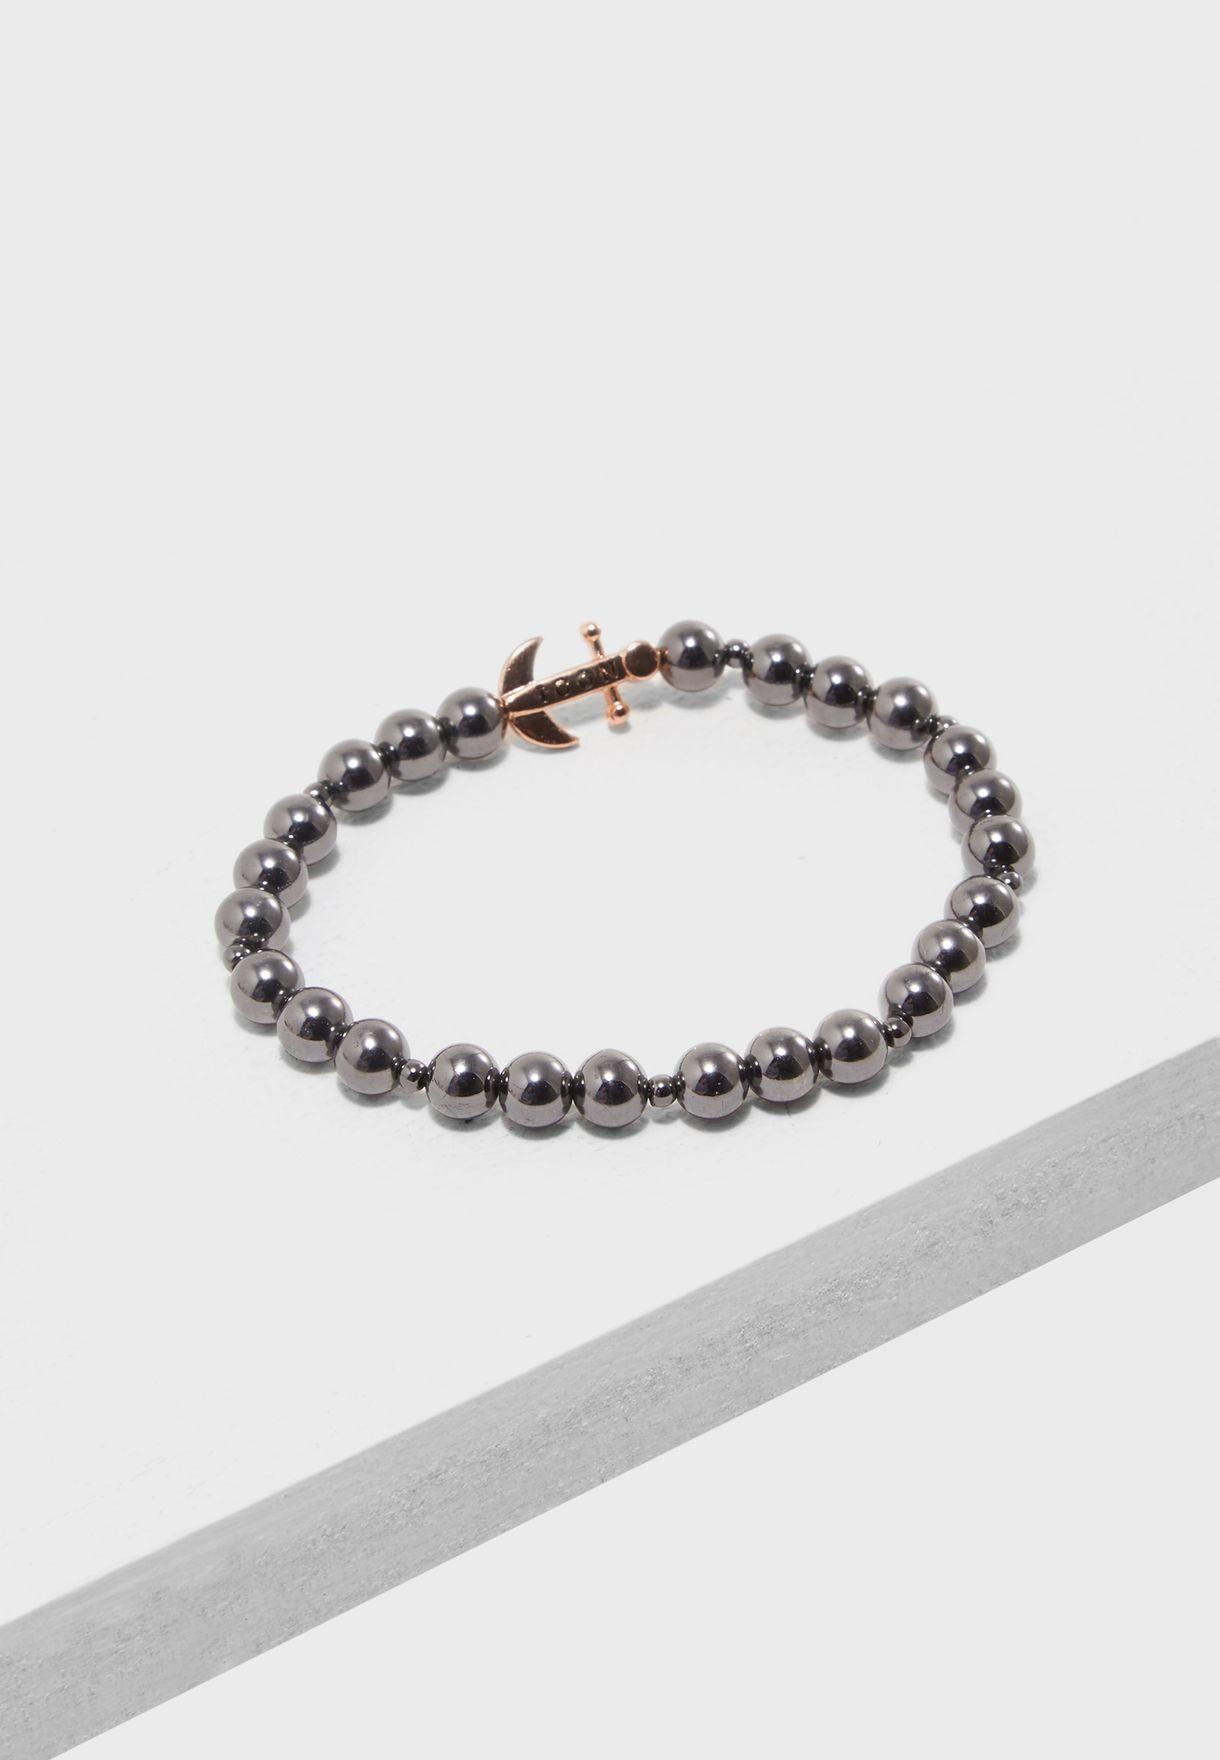 Finish Stretch Bead Bracelet